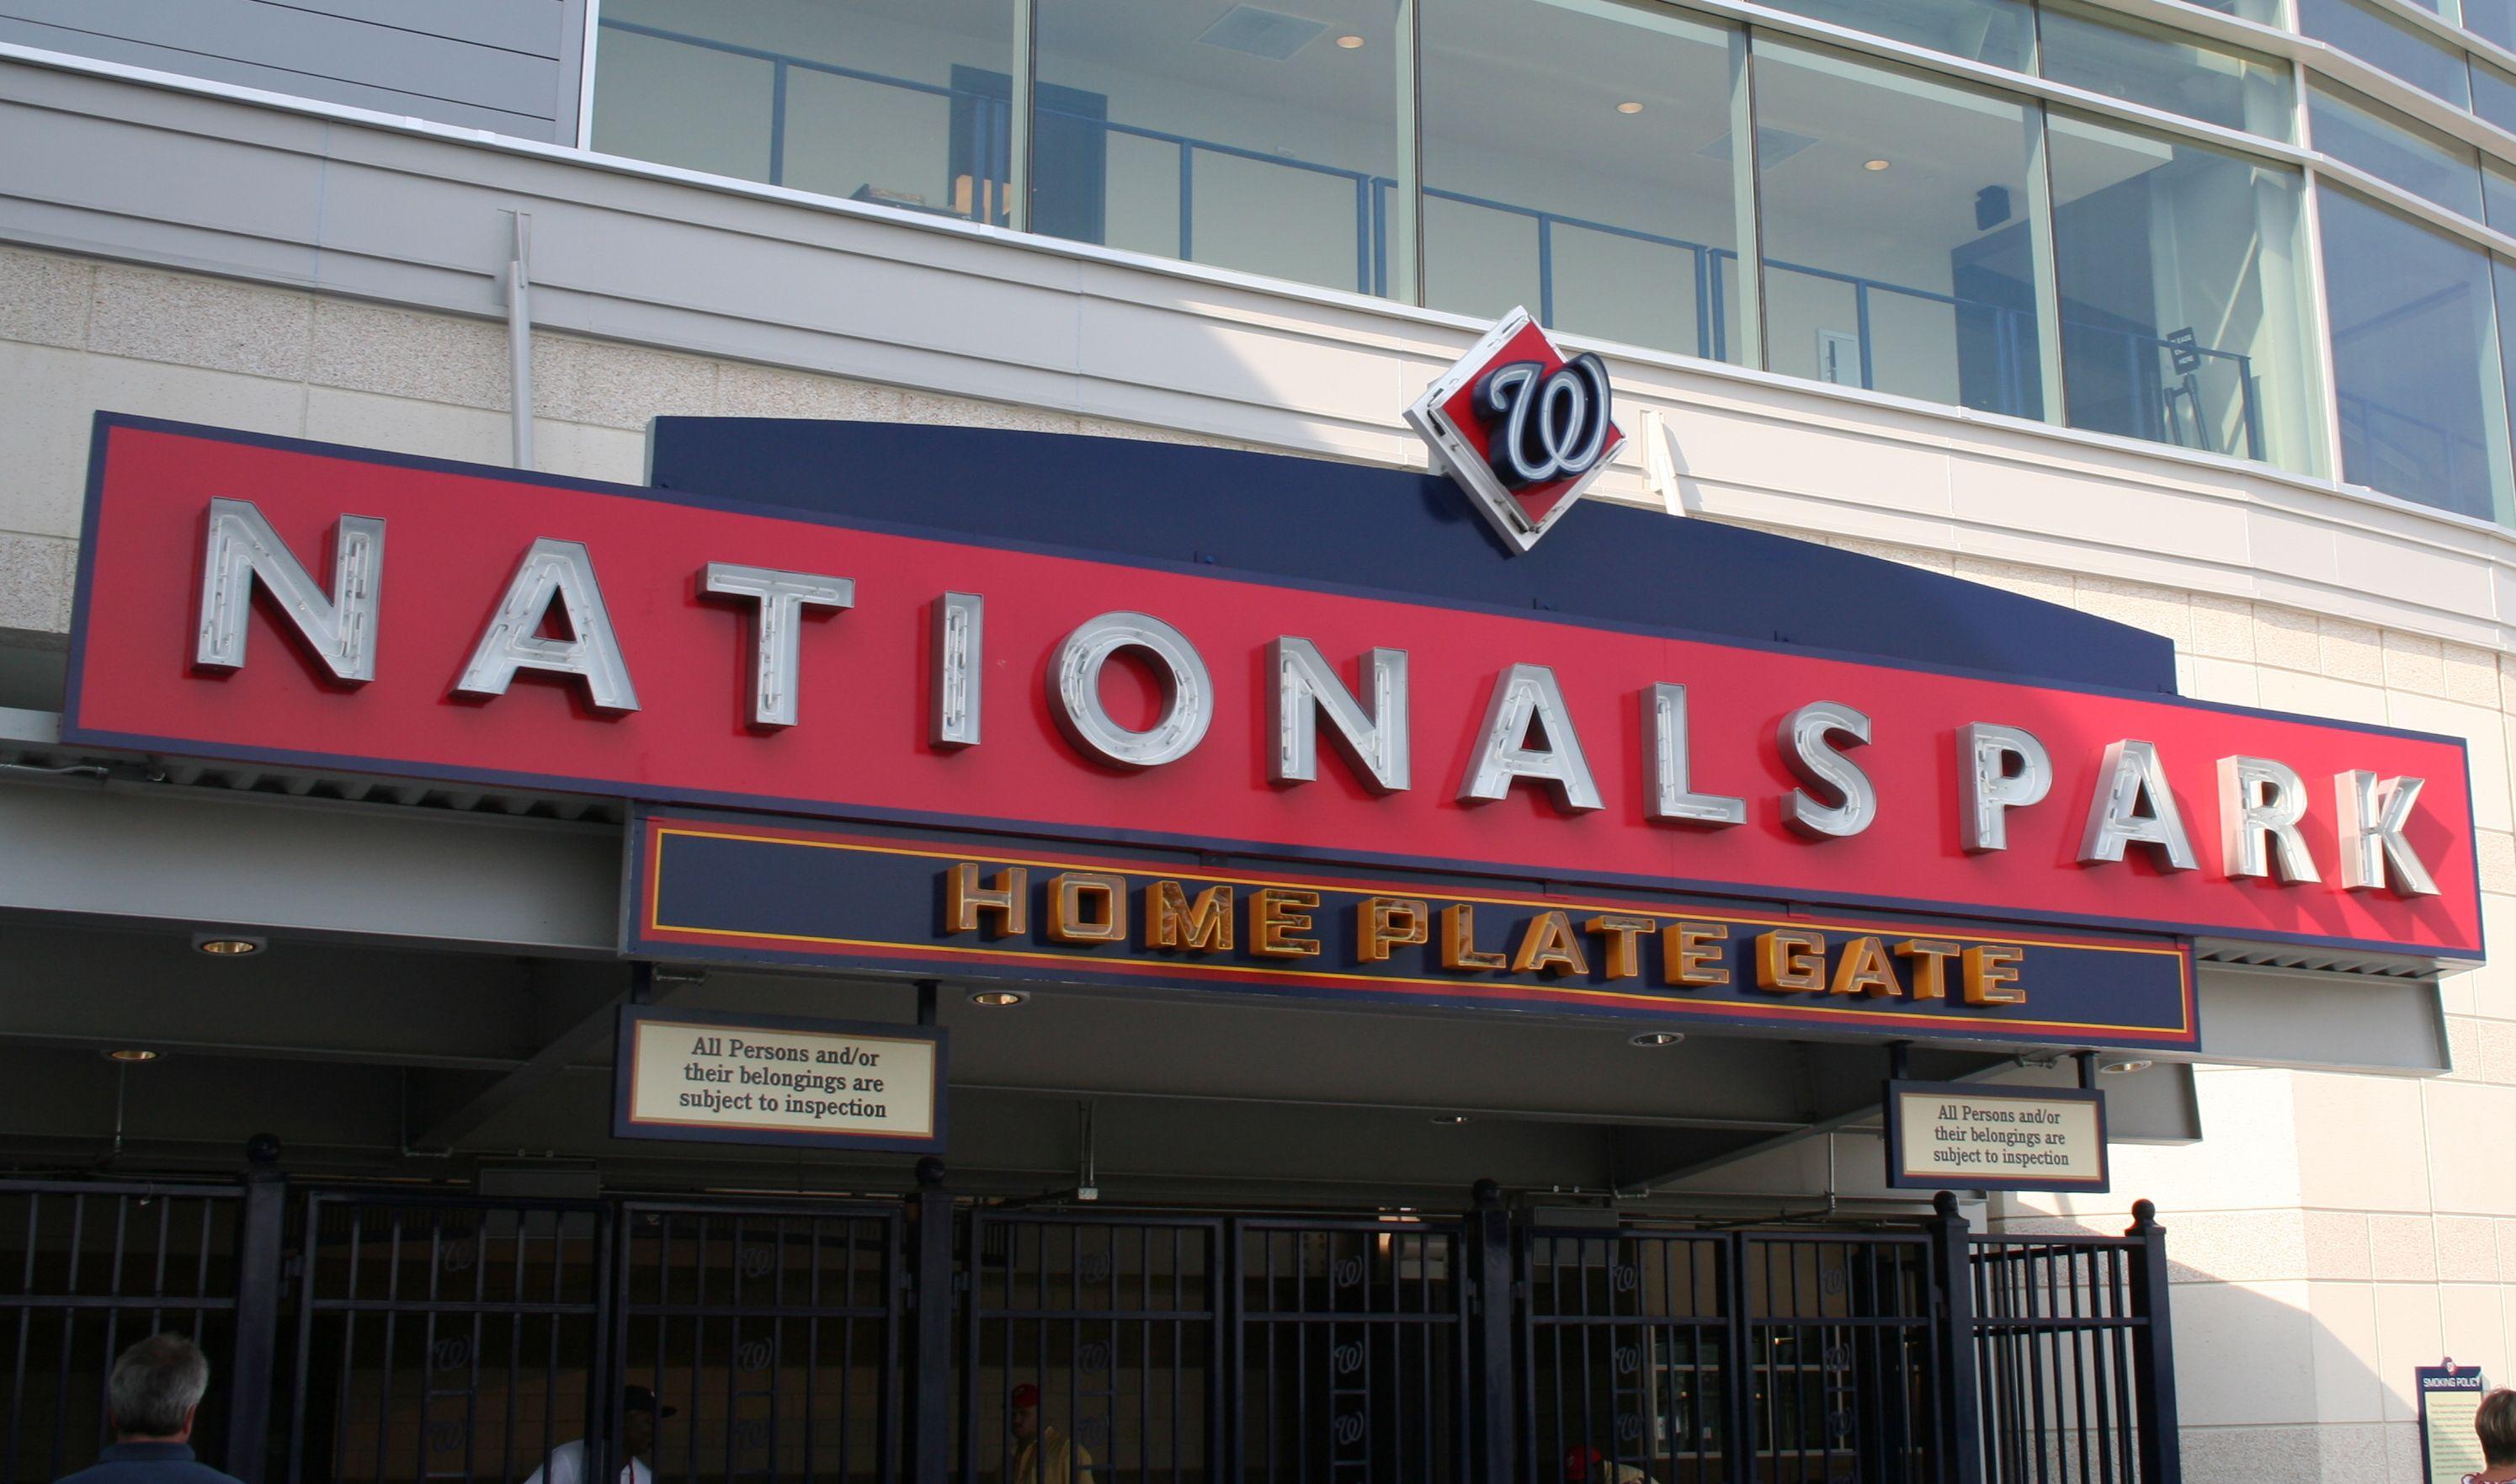 Home Plate Gate